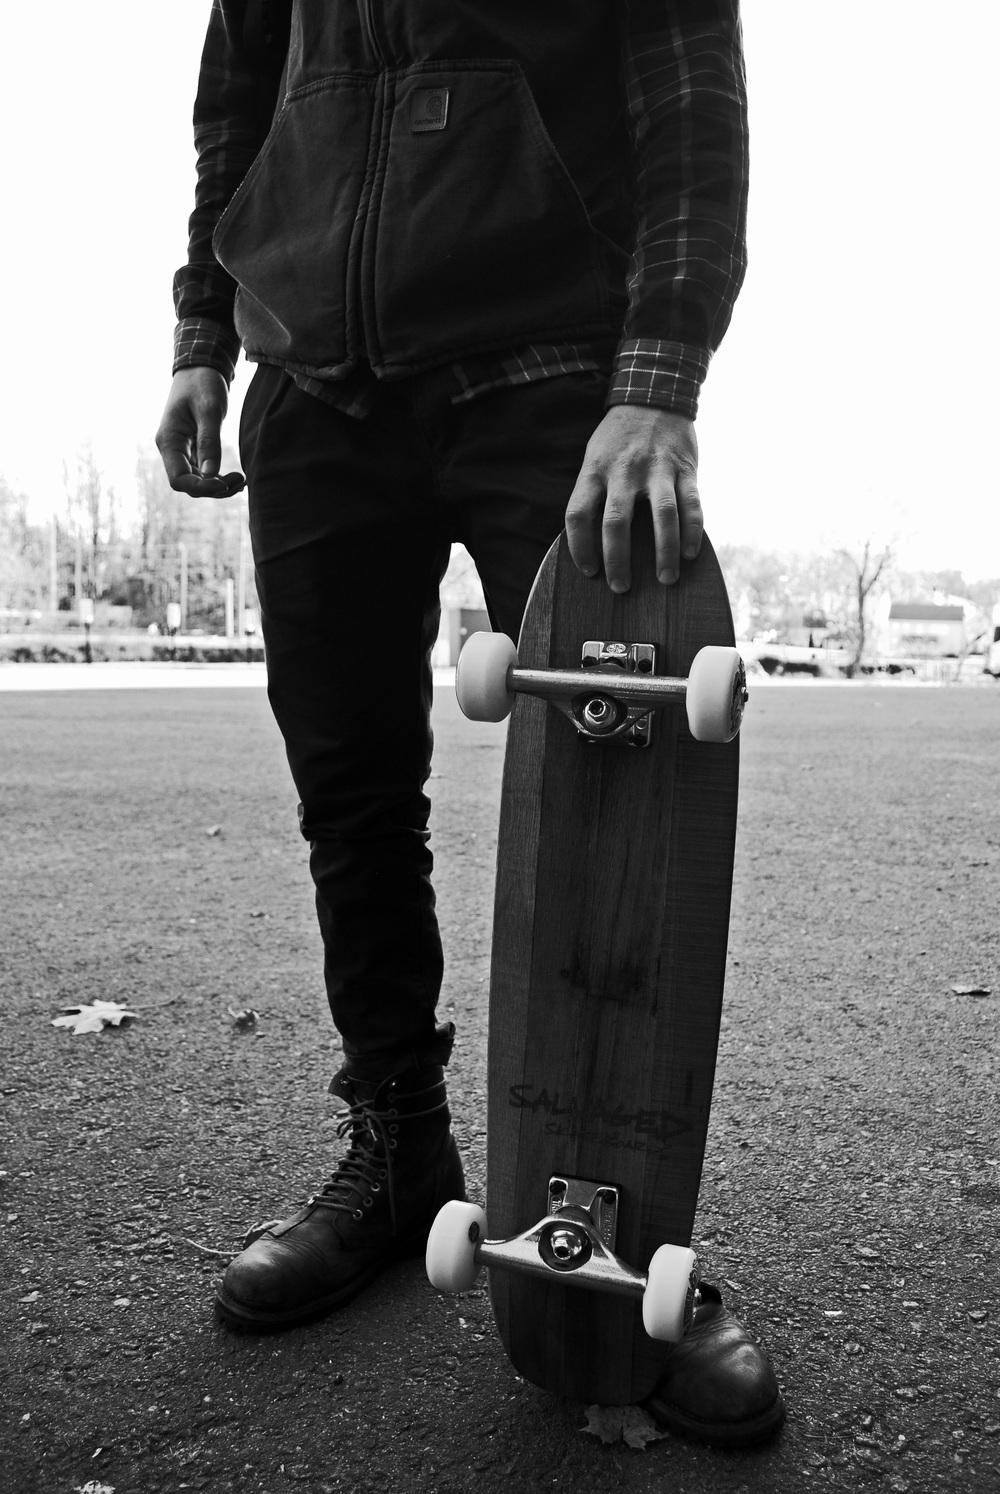 Salvaged Skateboard